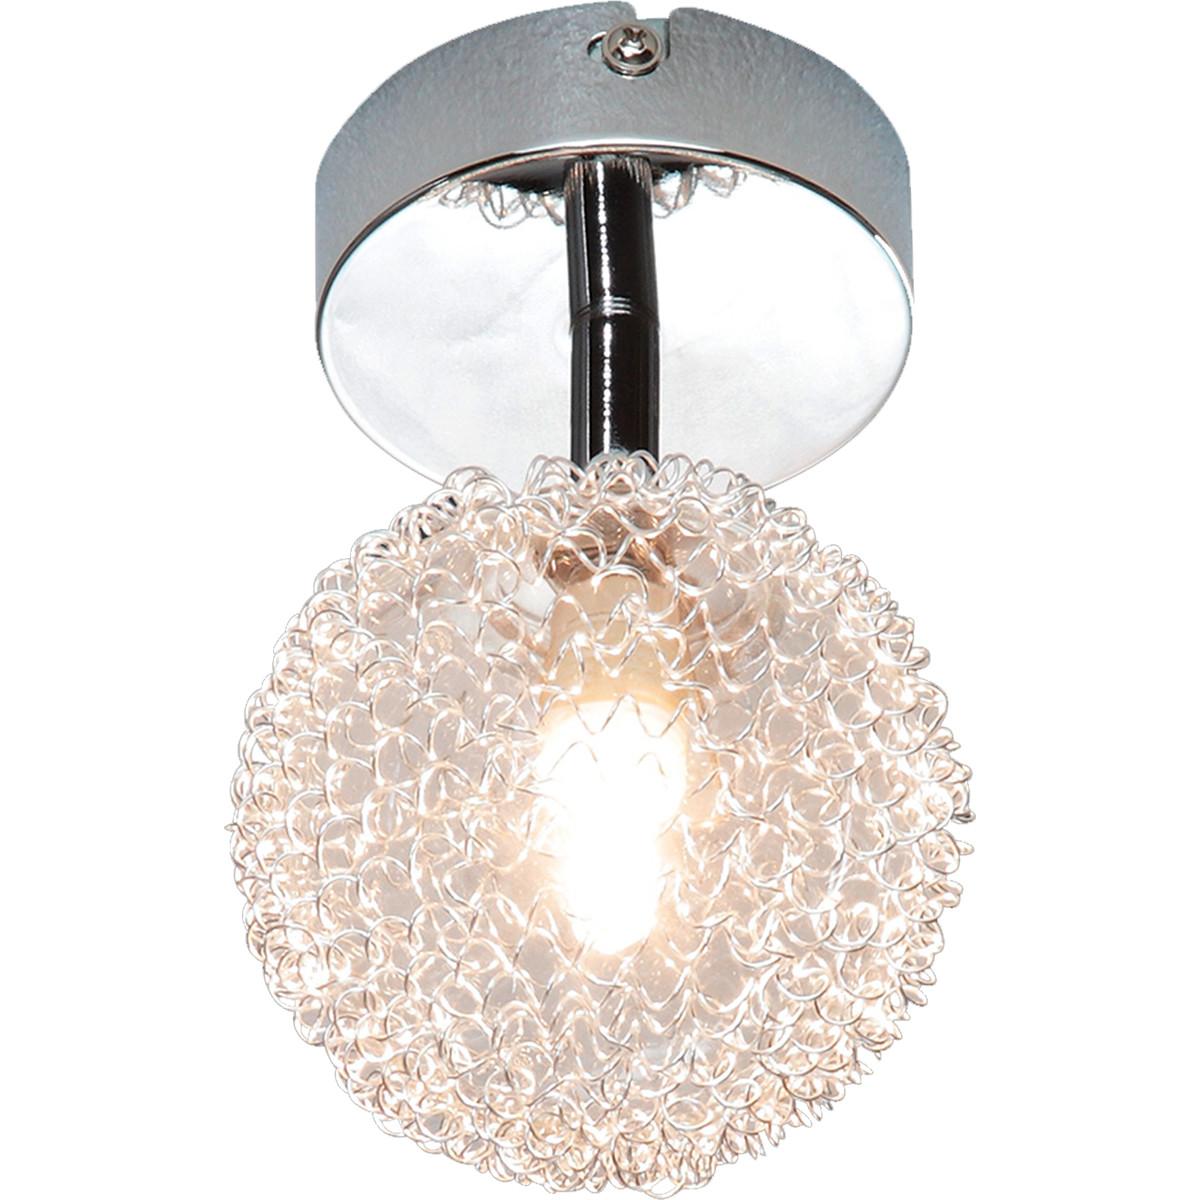 LED Plafondlamp - Plafondverlichting - Trion Ware - G9 Fitting - 1-Lichts - Rond - Glans Chroom - Al